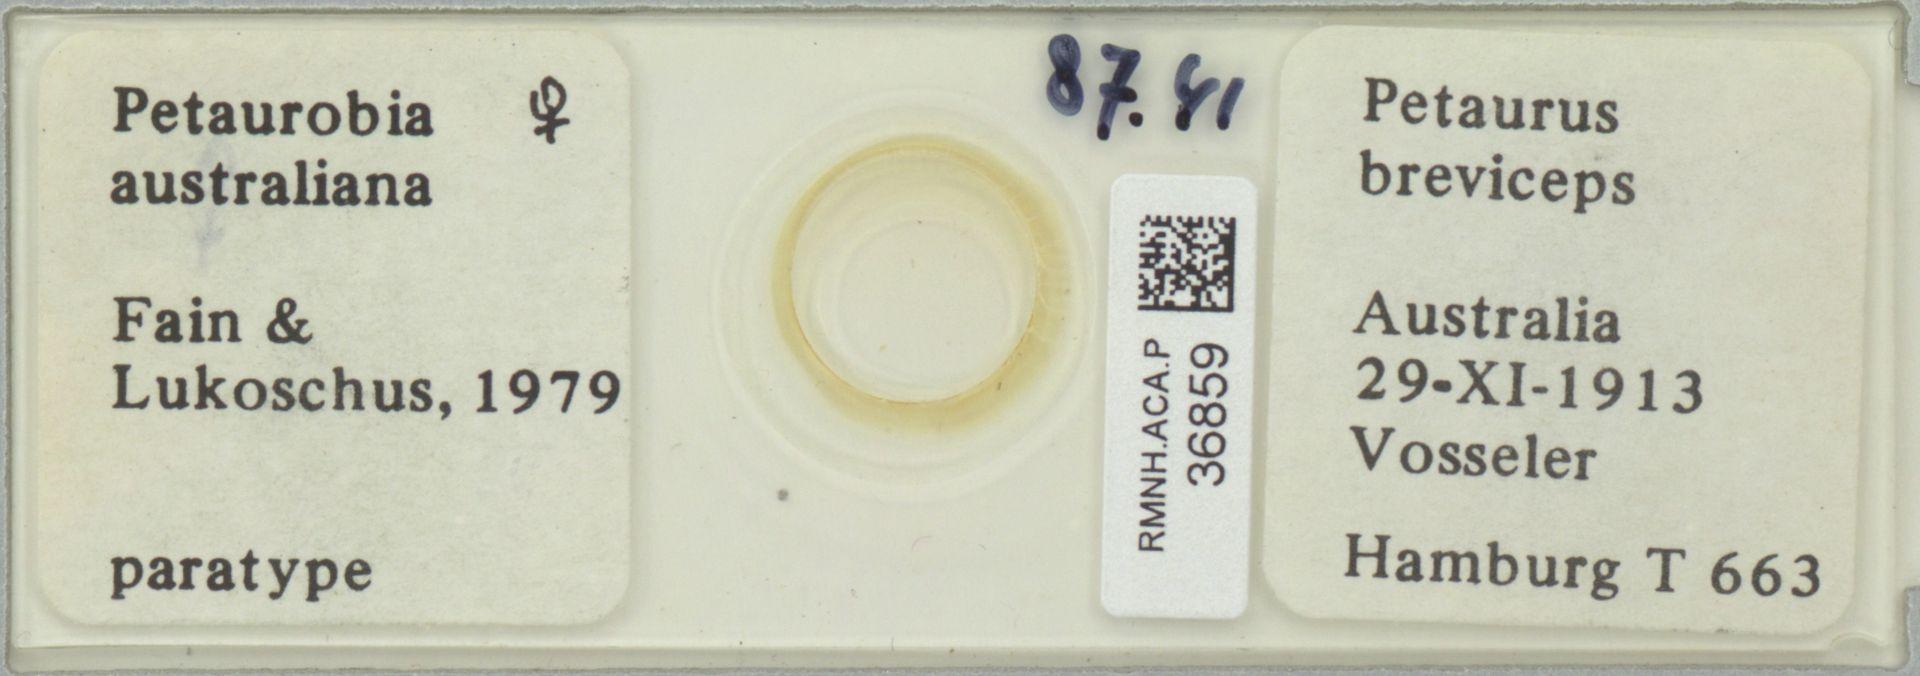 RMNH.ACA.P.36859 | Petaurobia australiana Fain & Lukoschus, 1979